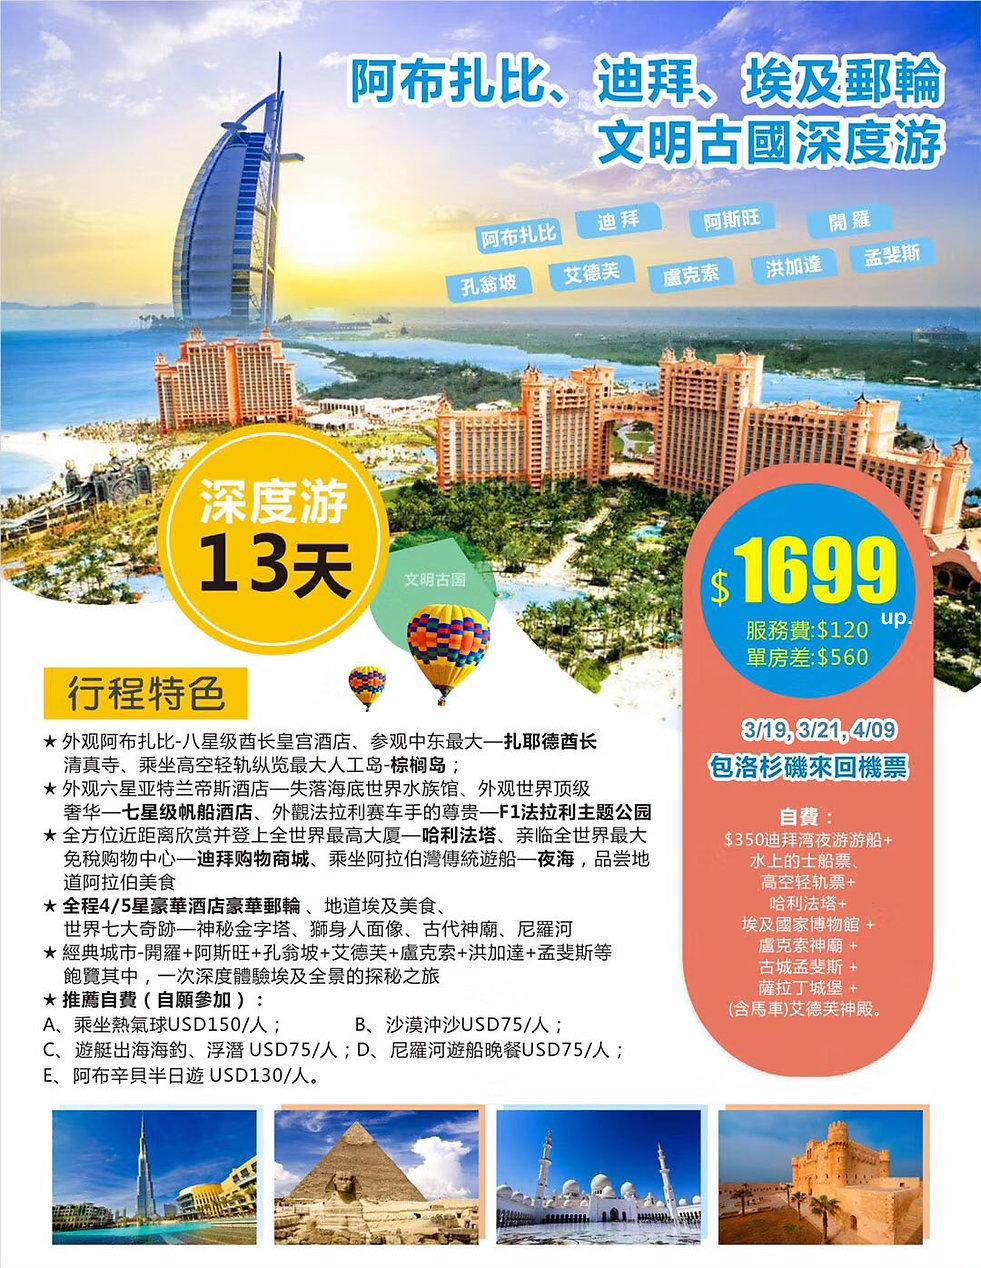 WeChat Image_20191104061230 copy.jpg